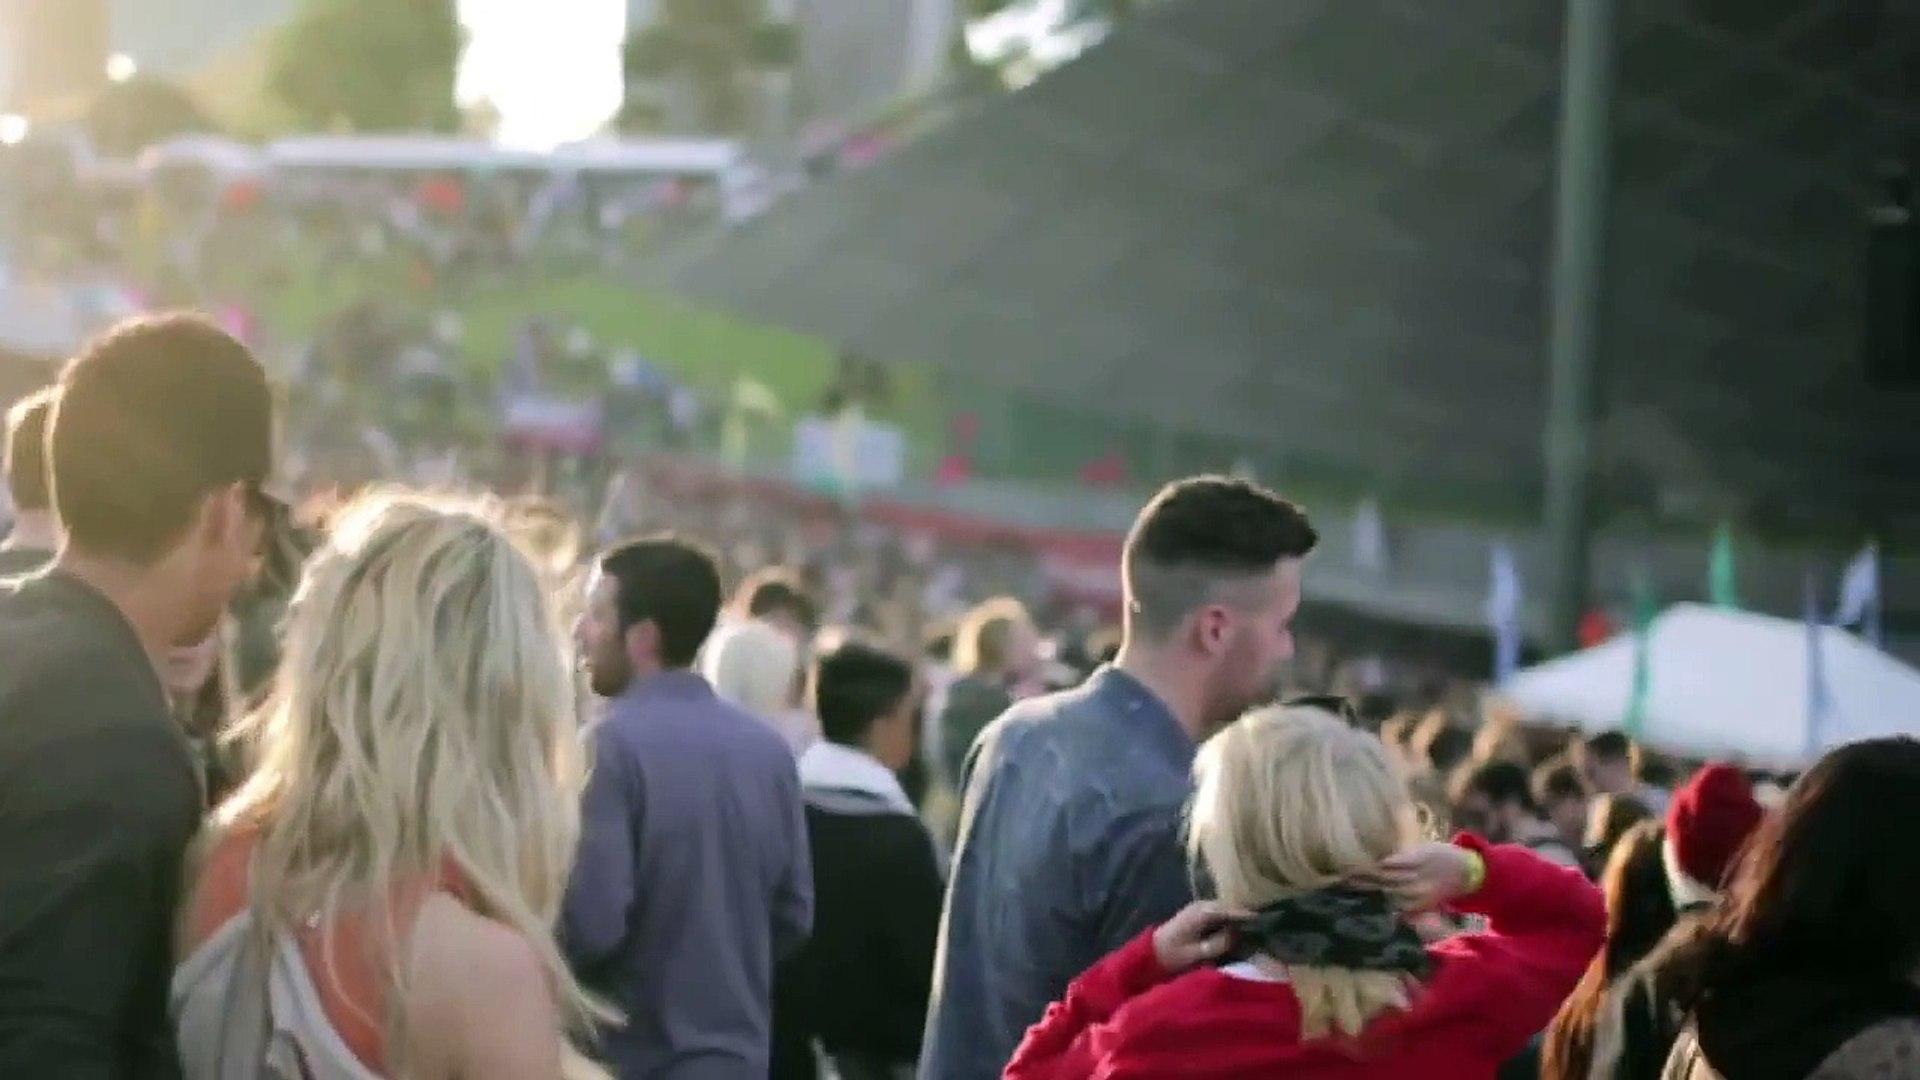 Australian University Games ft. Aston Shuffle, Feenixpawl, Ruby Rose + More!